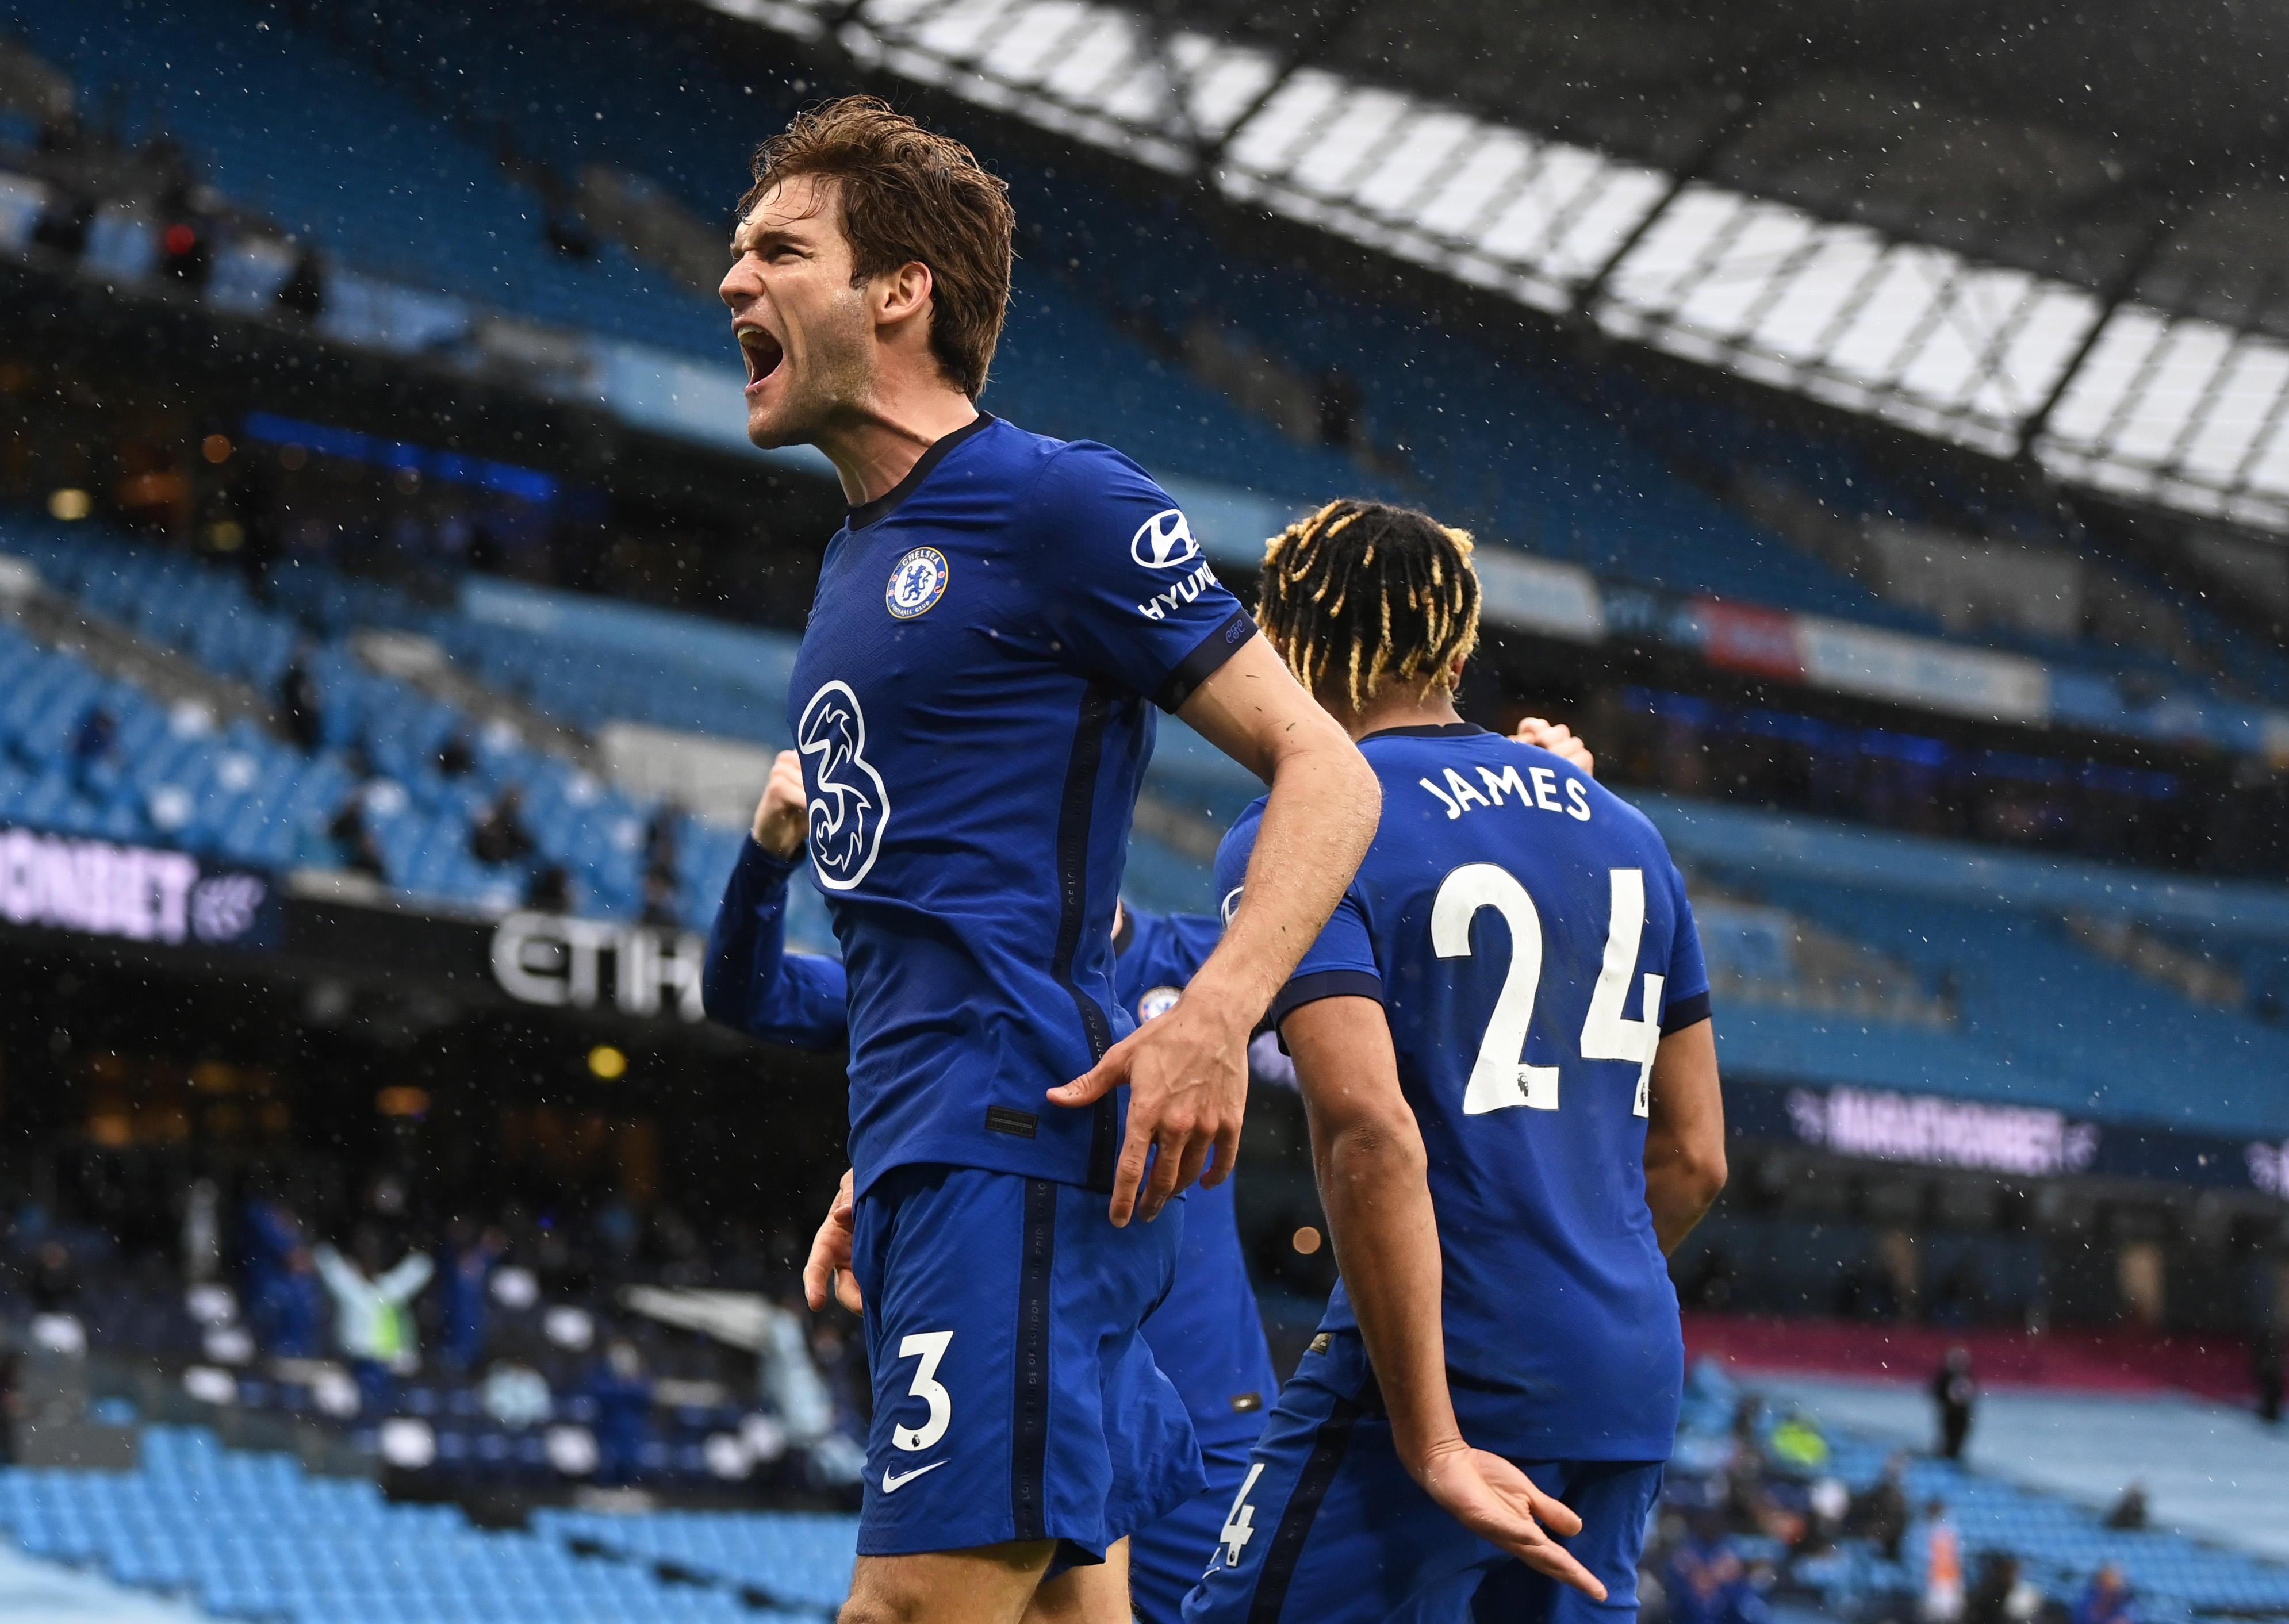 Manchester City vs. Chelsea score: Marcos Alonso strike postpones title clinch for Guardiola's side - CBSSports.com